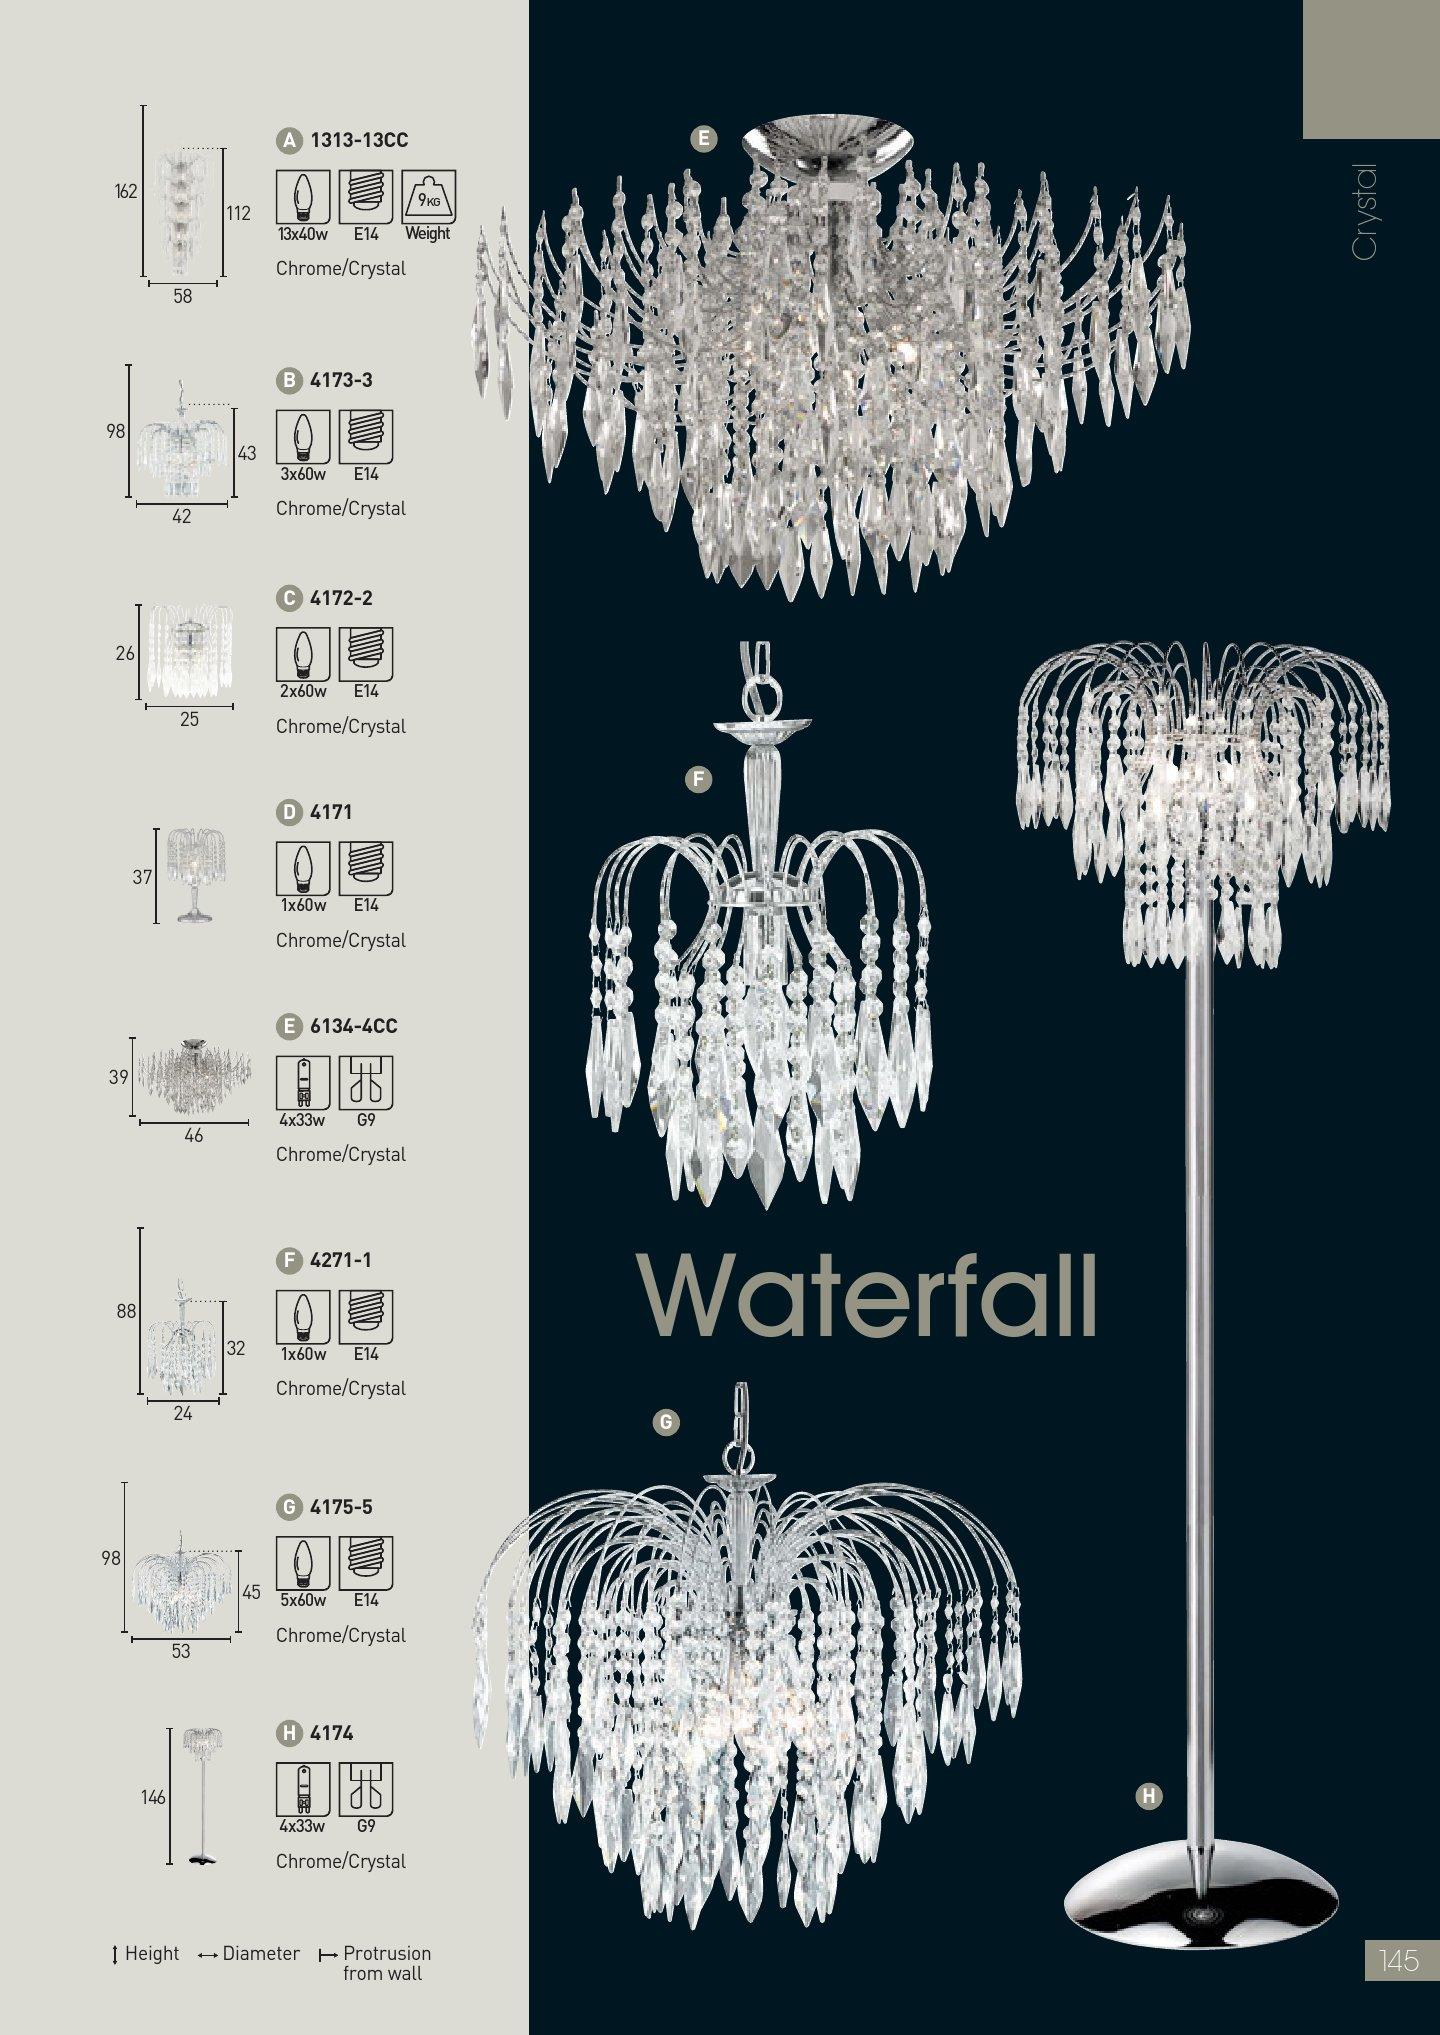 Waterfall 4175 5